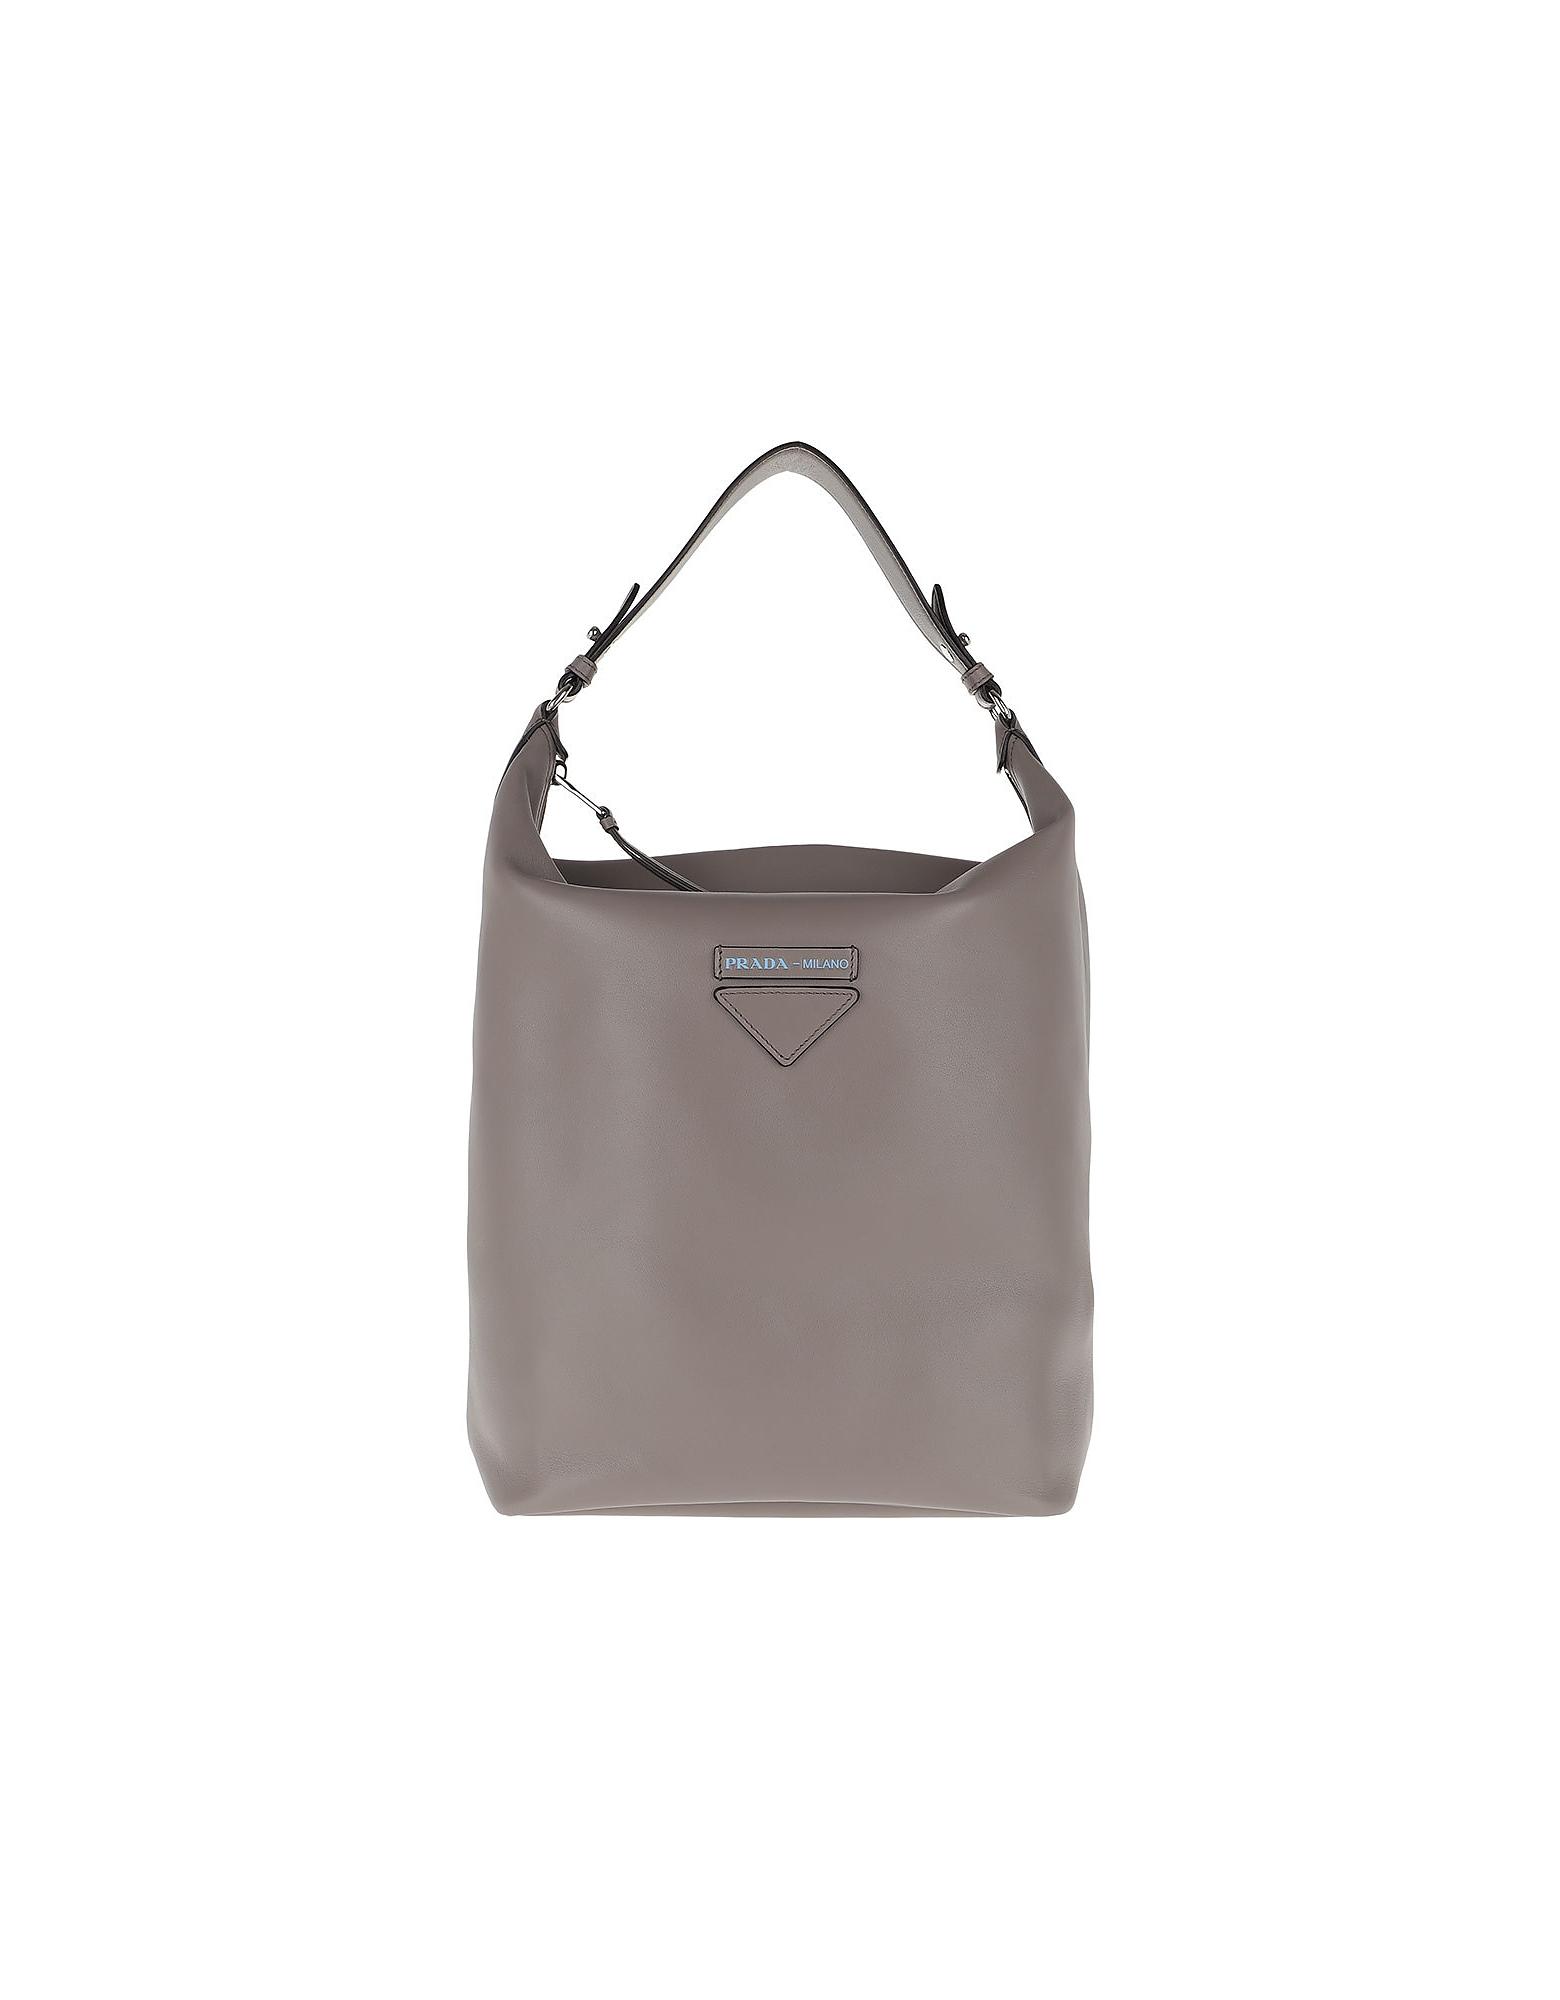 Prada Handbags, Etiquette Hobo Bag Leather Argilla